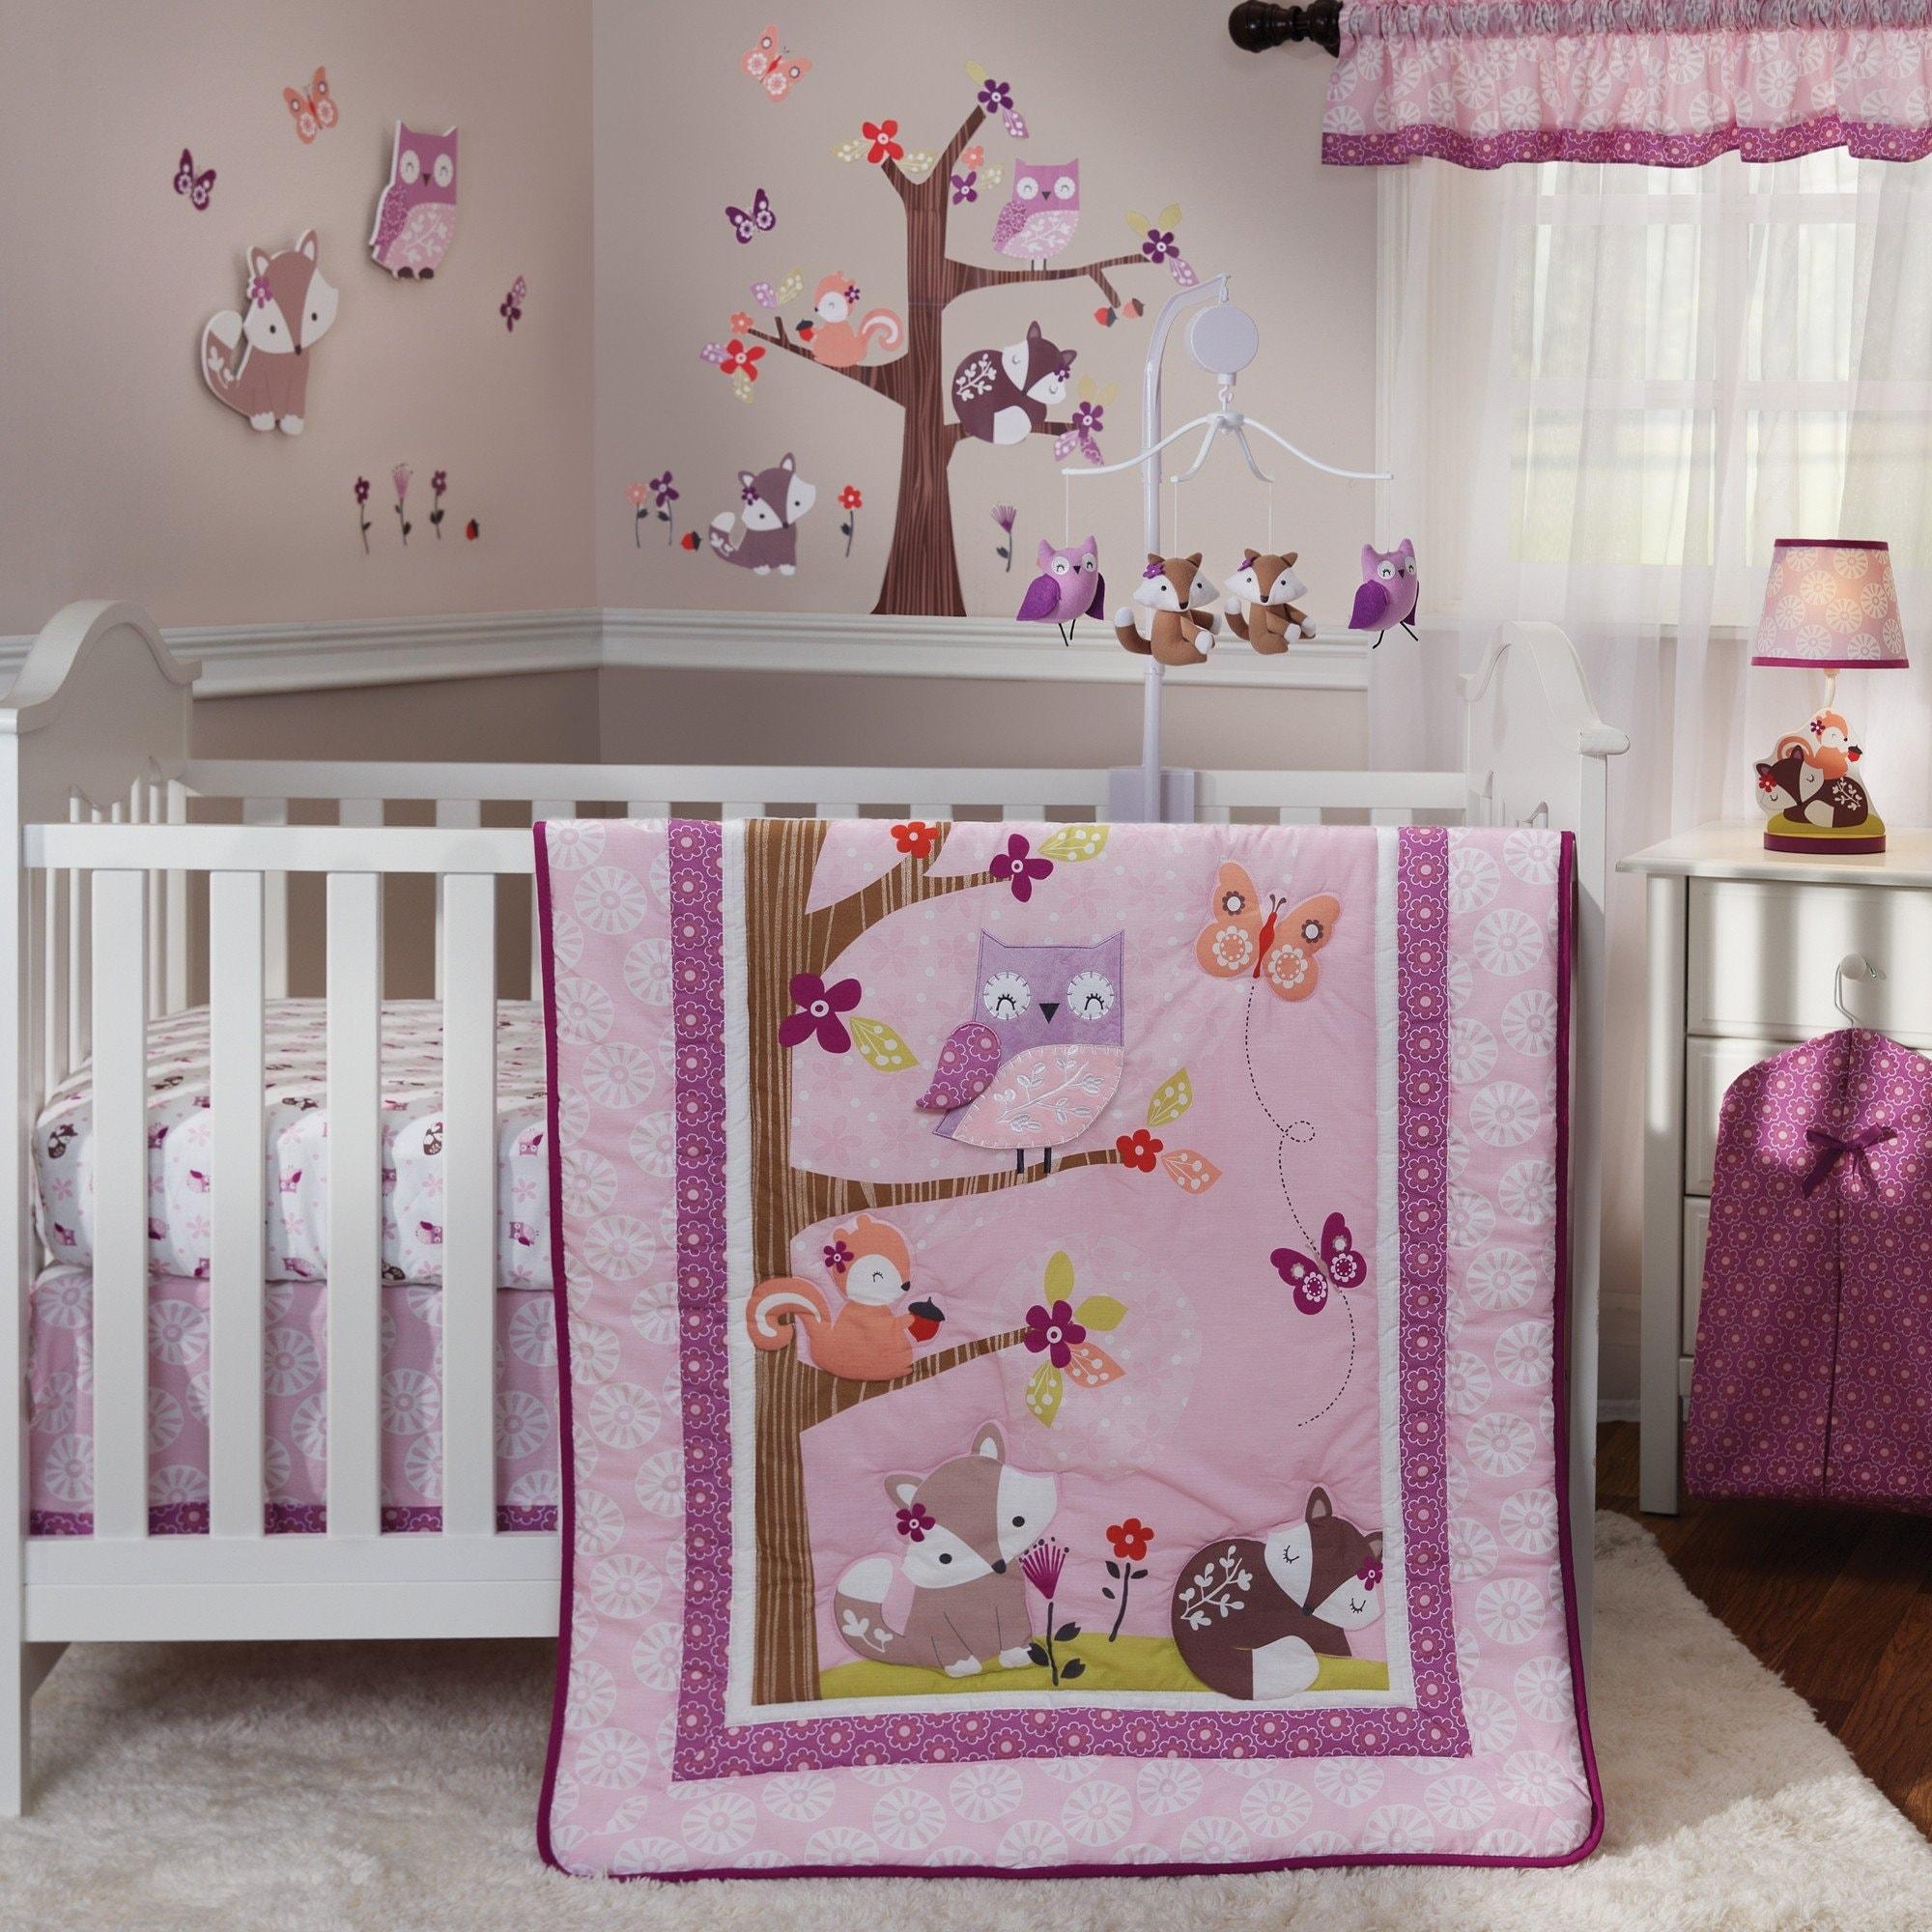 Bedtime Originals Lavender Woods Purple Woodland Animal 3 Piece Baby Nursery Crib Bedding Set